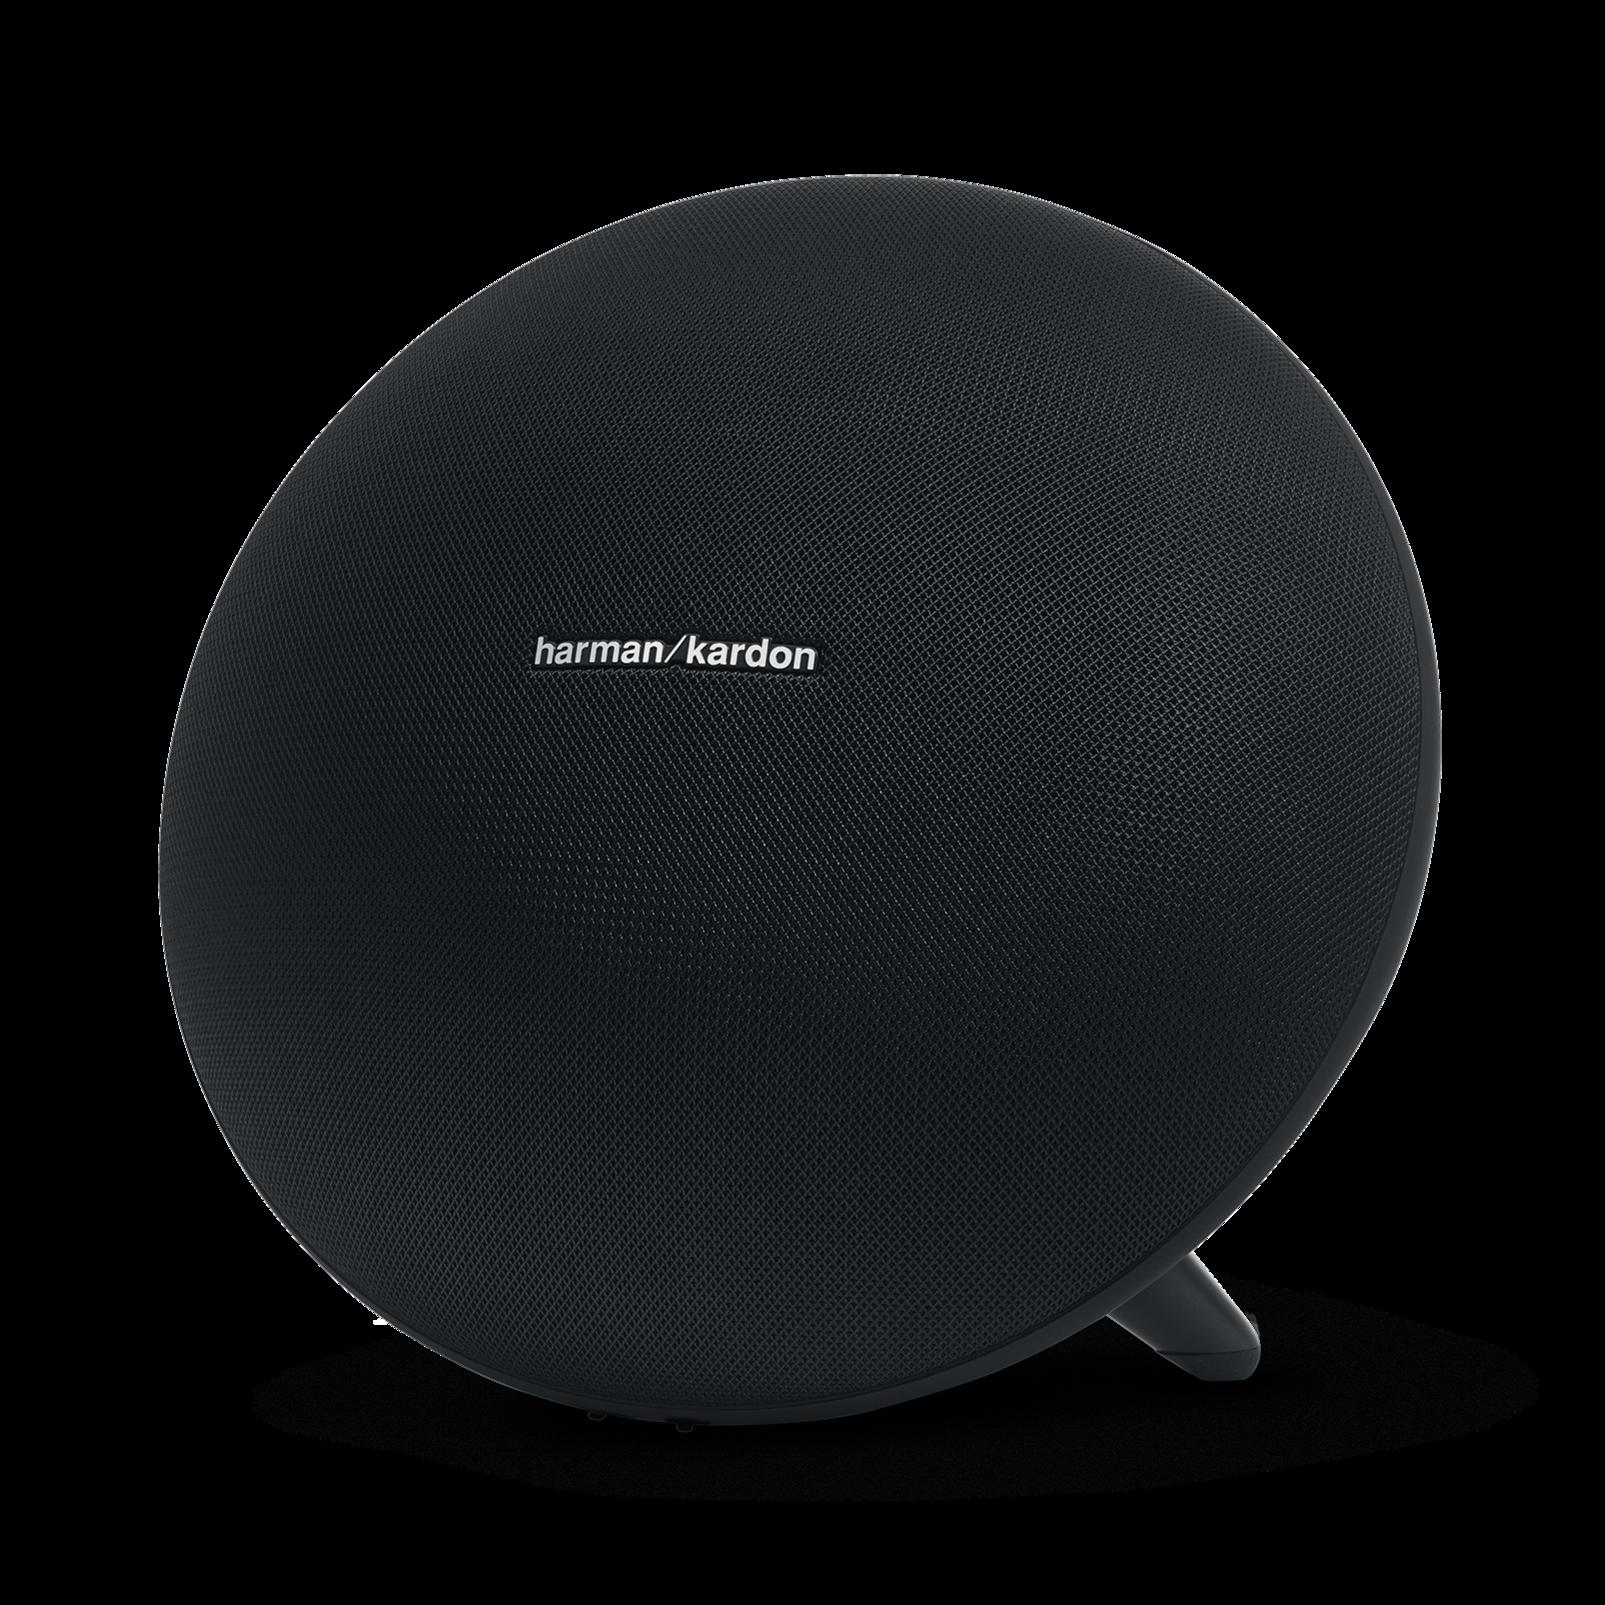 Onyx Studio 3 - Black - Portable Bluetooth Speaker - Hero